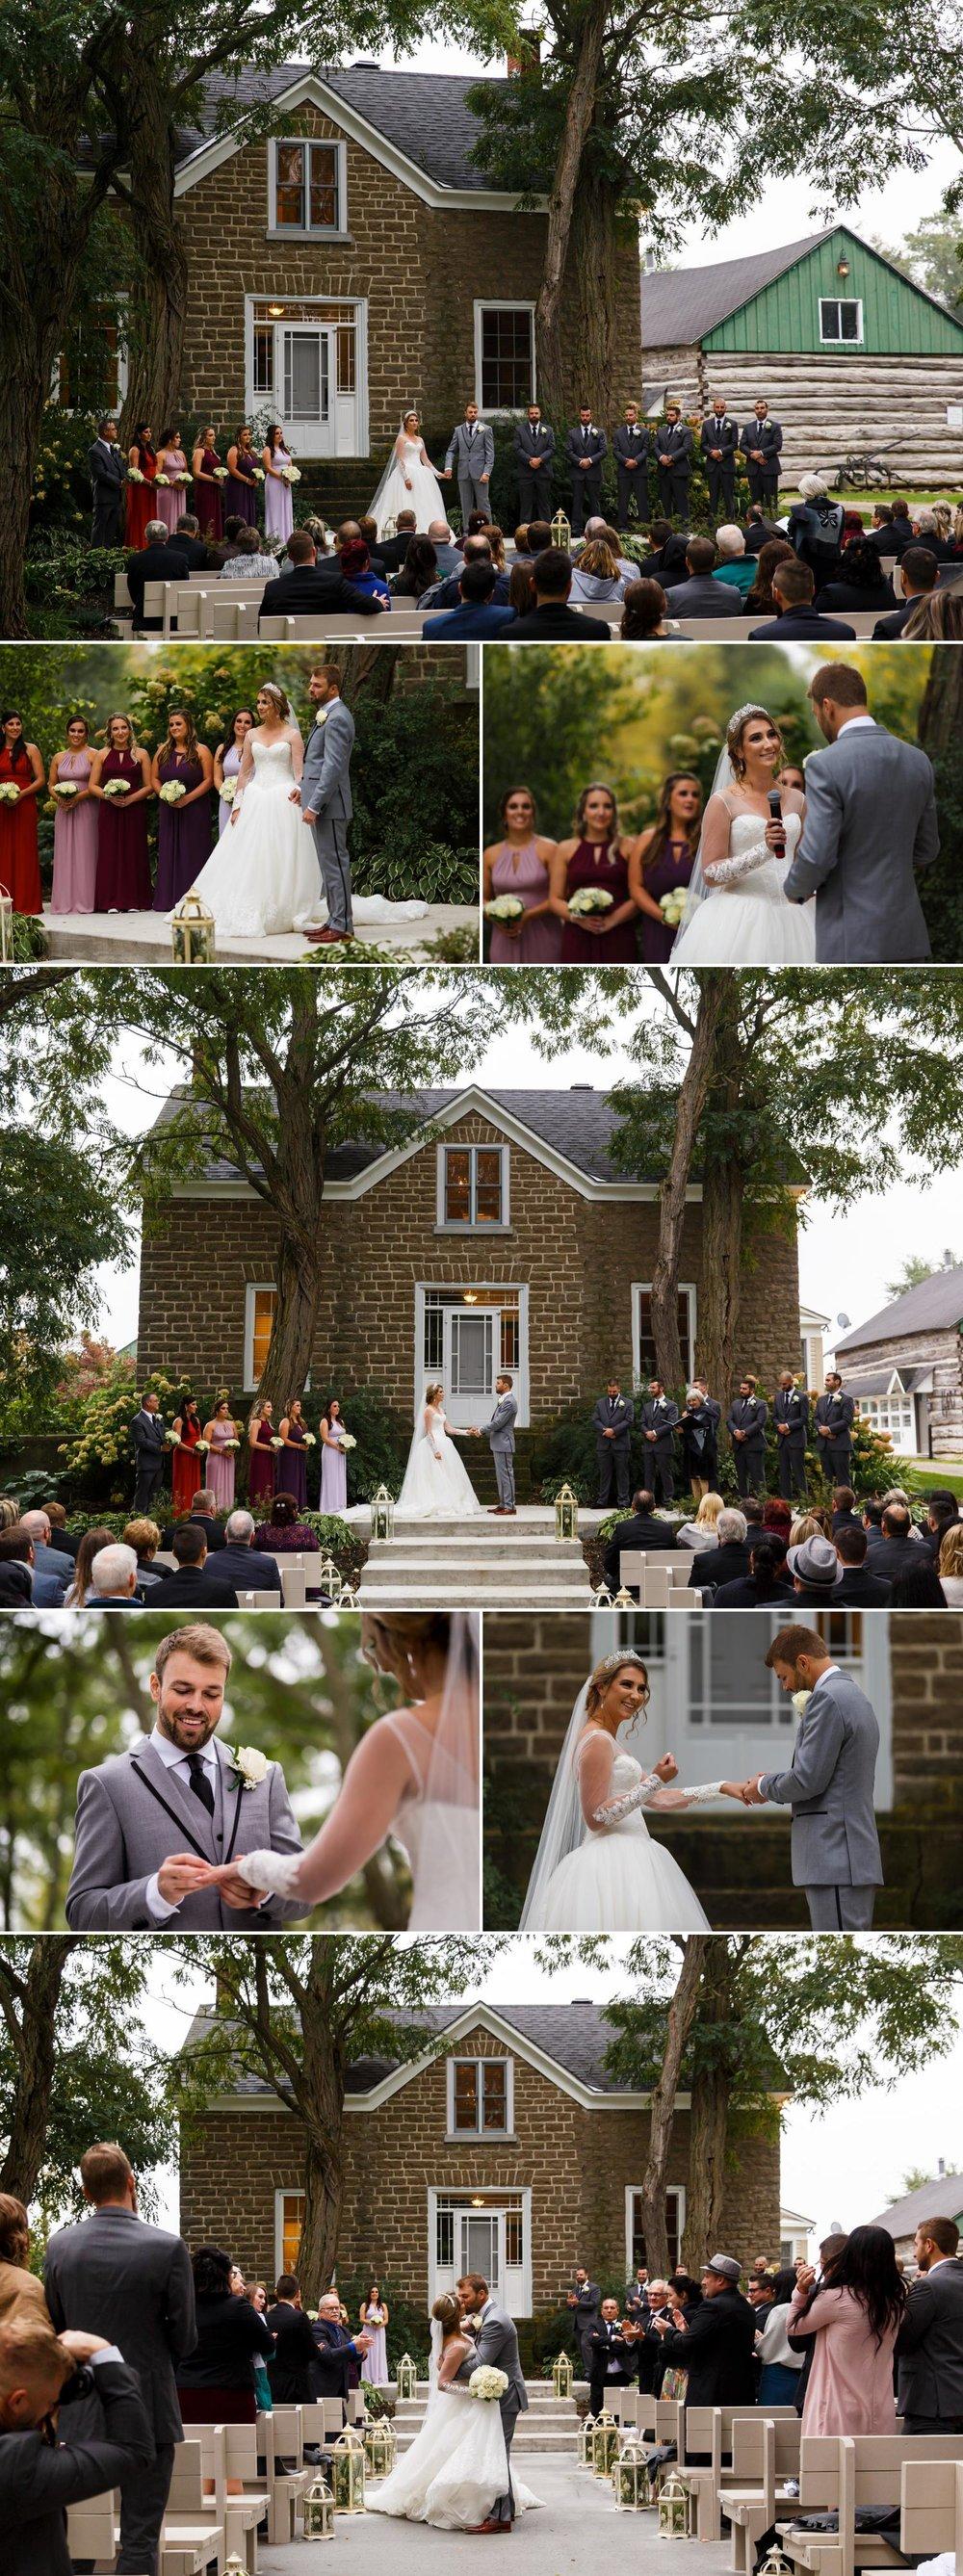 photos of an autumn wedding at stonefields in ottawa